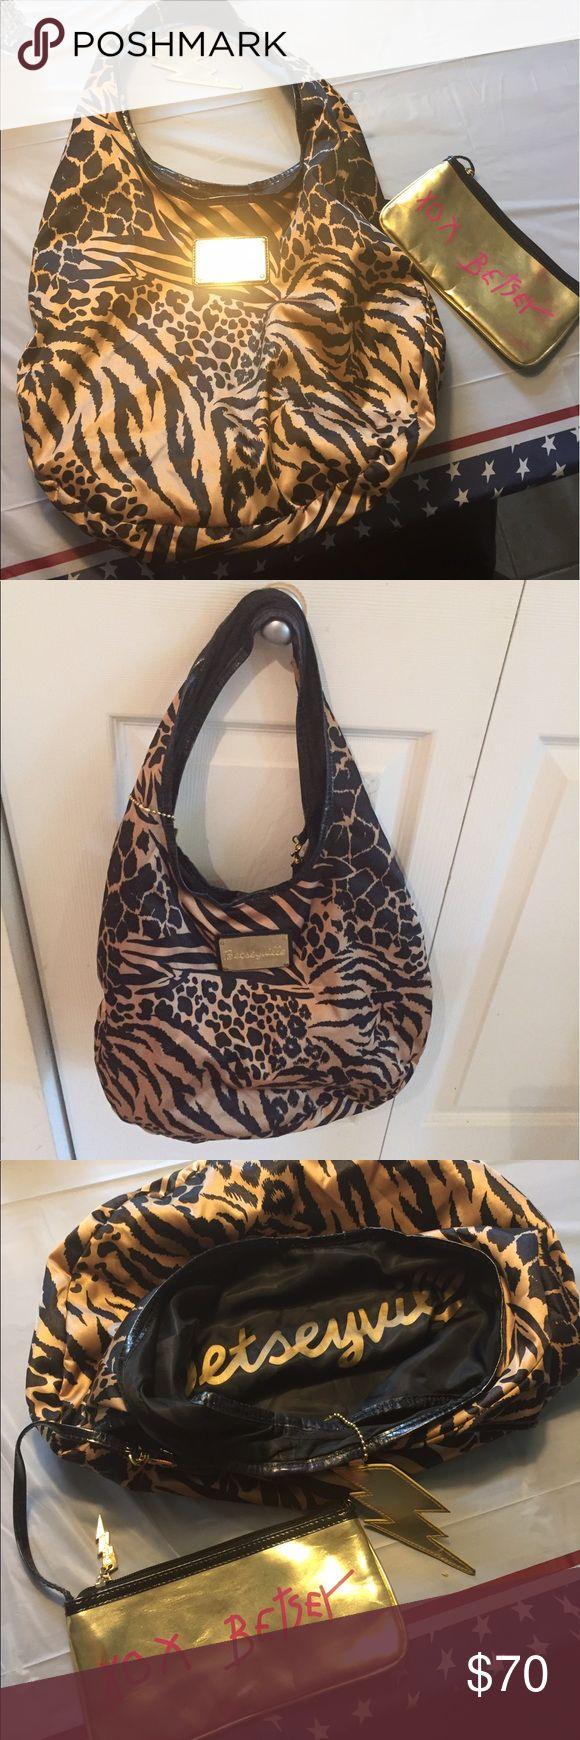 Betsey Johnson Shoulder Bag Cheetah Print Shoulder Bag includes all the bling makeup bag, key ring, plaque on Front, Signature Inside the bag and Animal Print Face and Signature on Makeup Bag gold & pink!!!! Betsey Johnson Bags Shoulder Bags